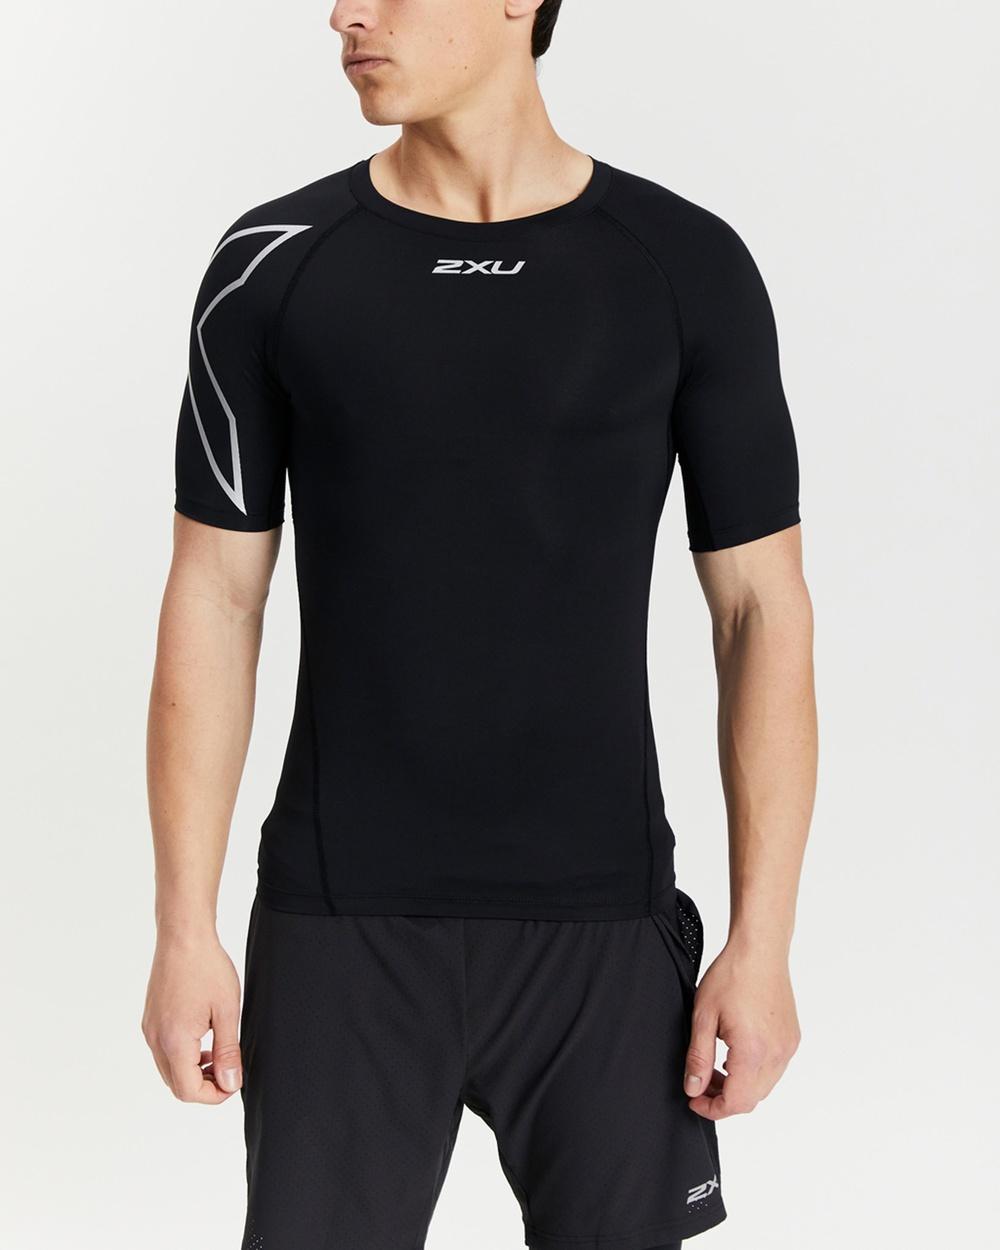 2XU Core Compression Short Sleeve Top all compression Black & Silver